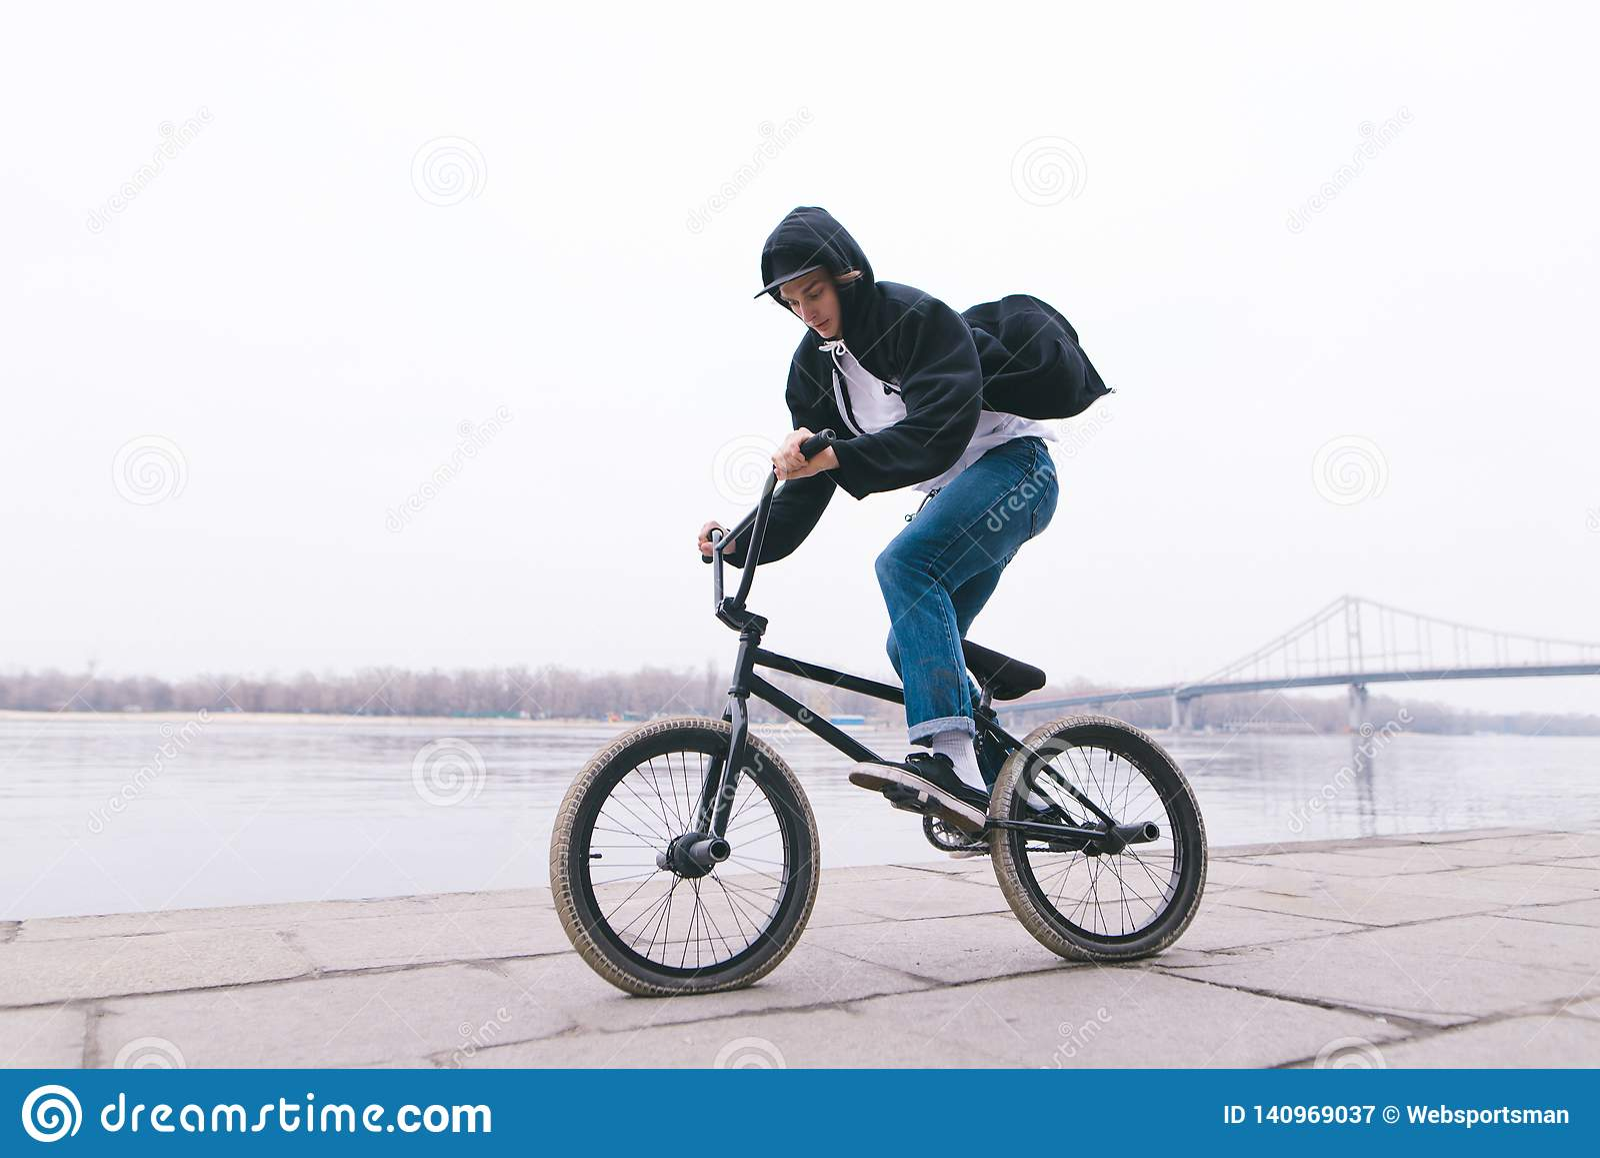 BMX rider rides a bike in the open air. BMX concept. Street style